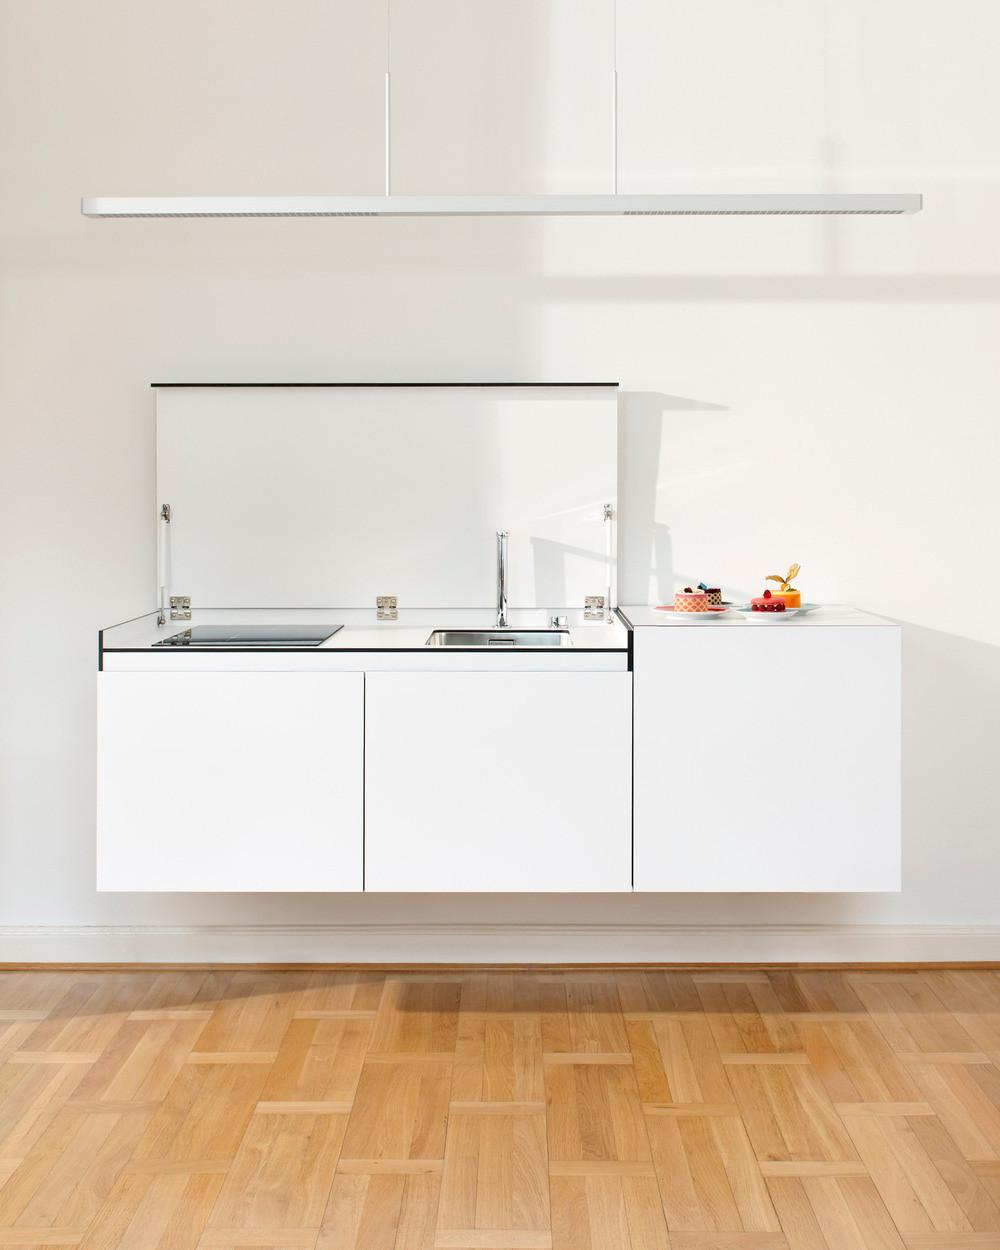 Miniki Küche Preis   V2com Newswire Design Architecture Lifestyle Press Kit